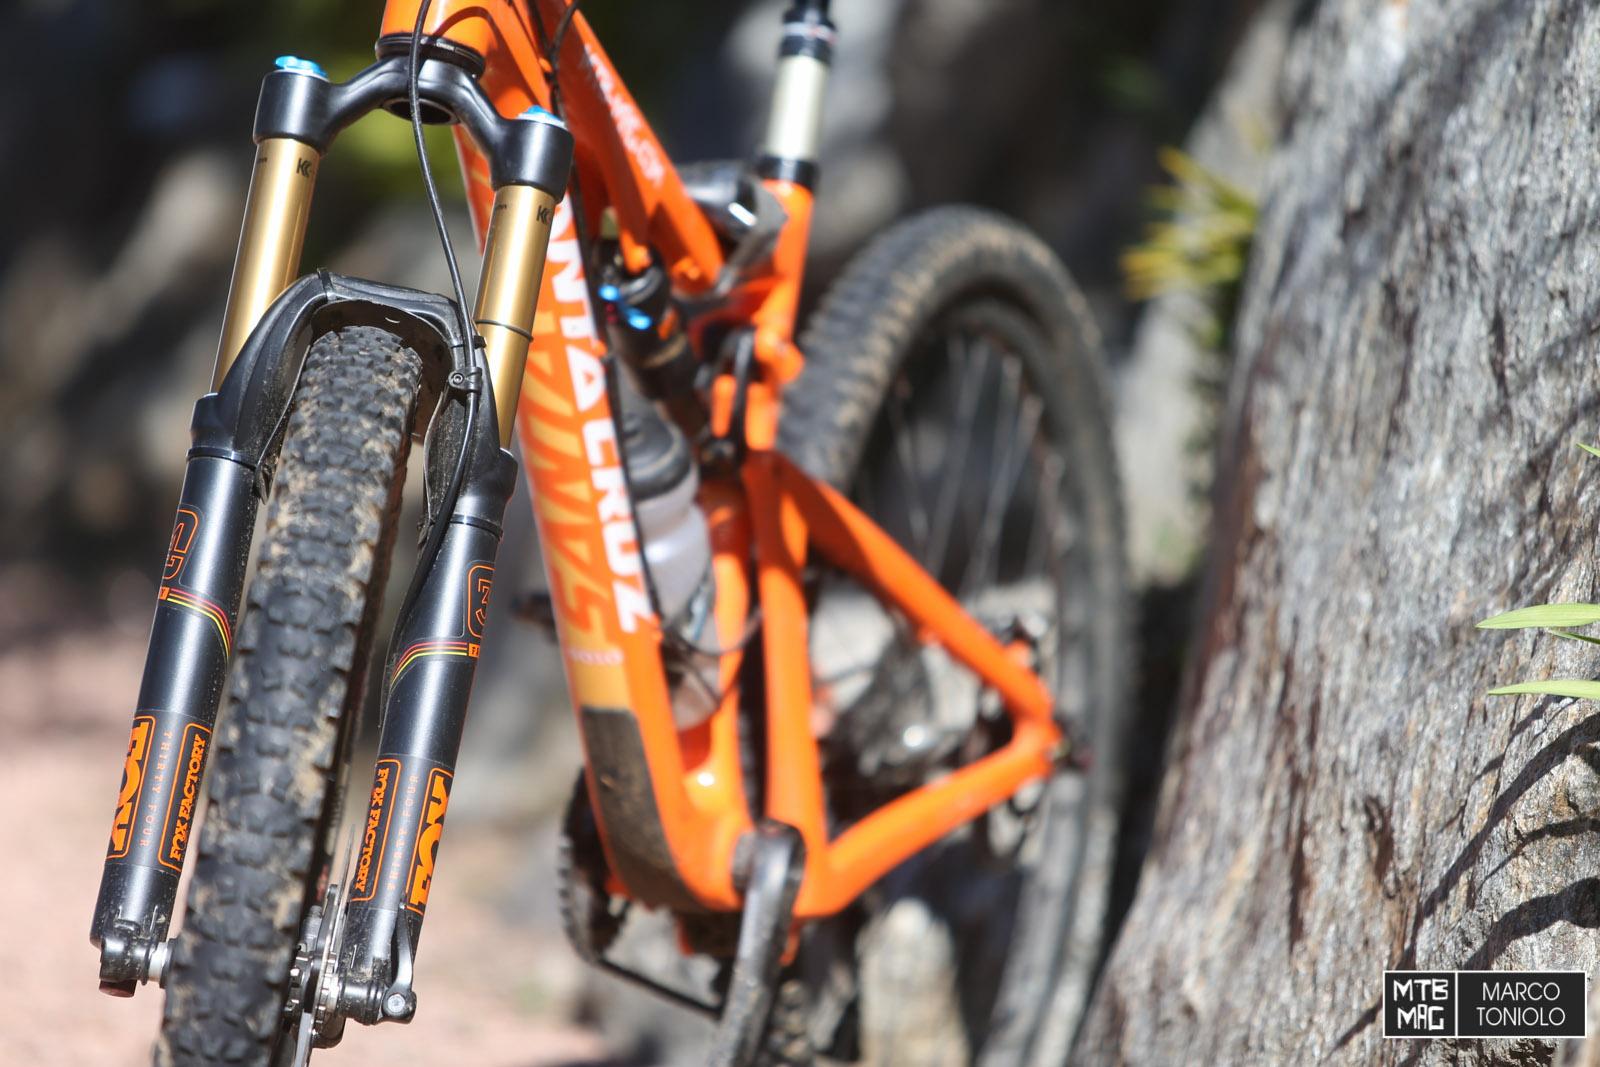 MTB-MAG COM - Mountain Bike Magazine | [Test] New Fox Float